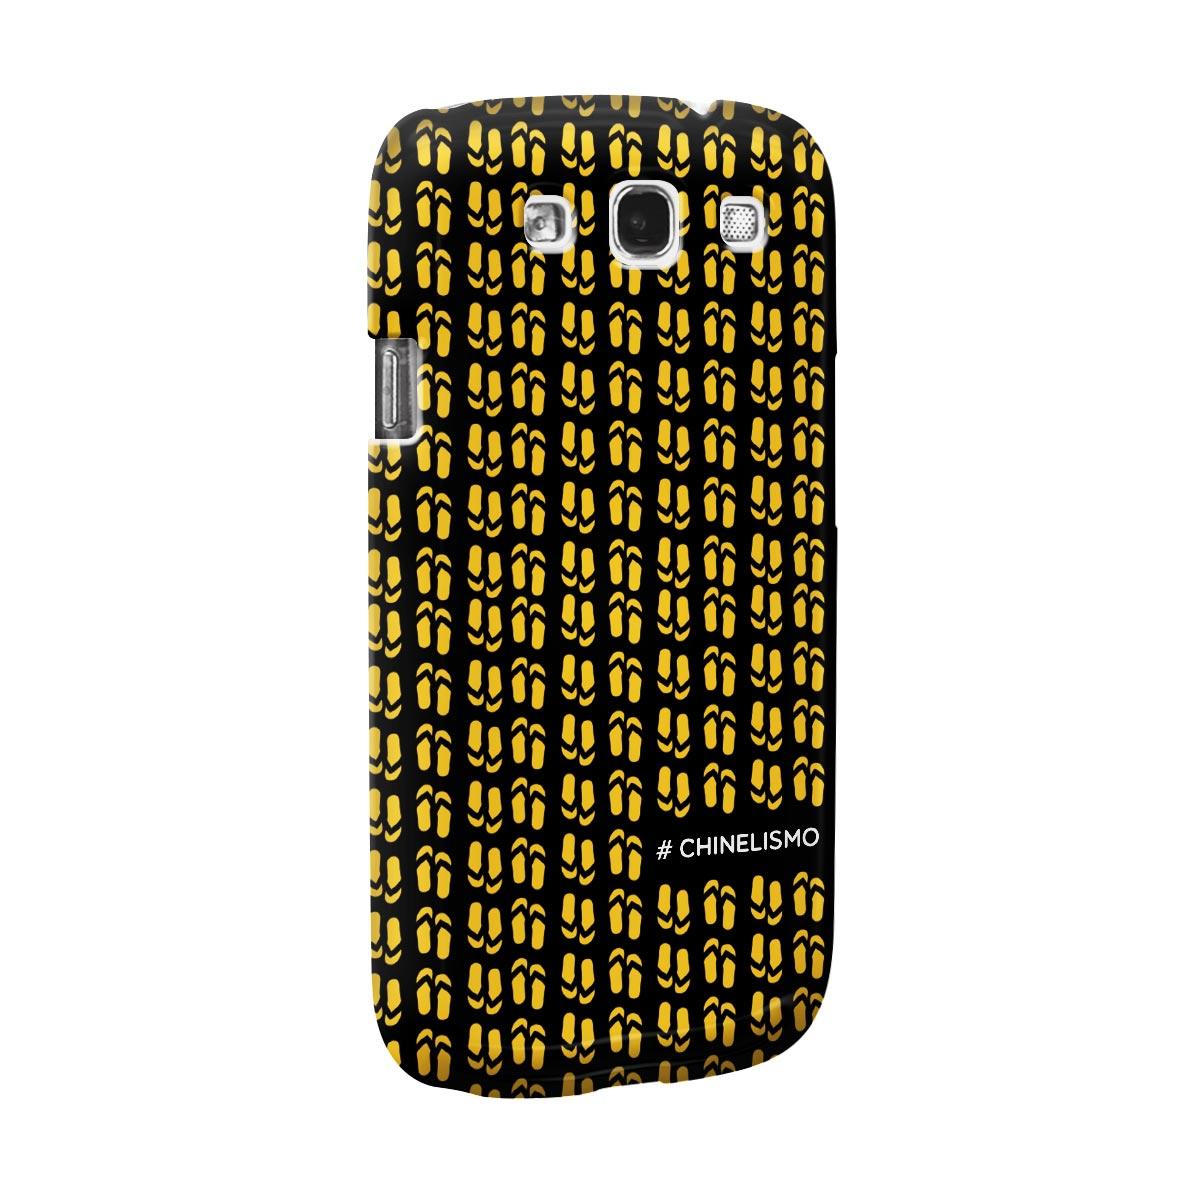 Capa de Celular Samsung Galaxy S3 Saulo #Chinelismo 2